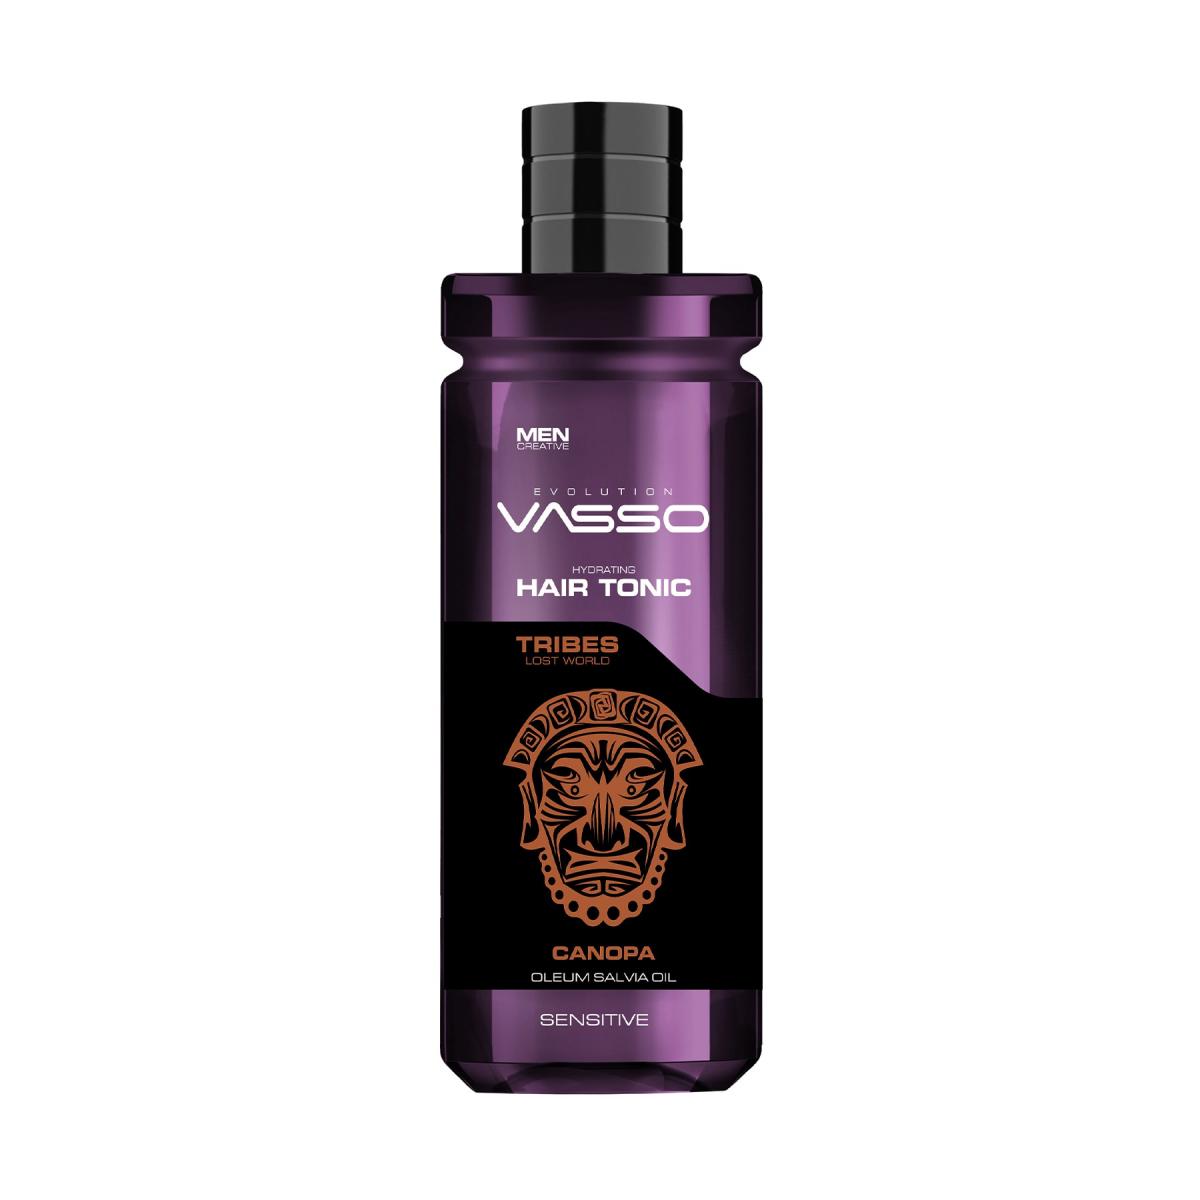 VASSO MAN Hassas Saç Derisi Için Rahatlatıcı Saç Toniği - Tribes Canopa Hair Tonic 260 Ml